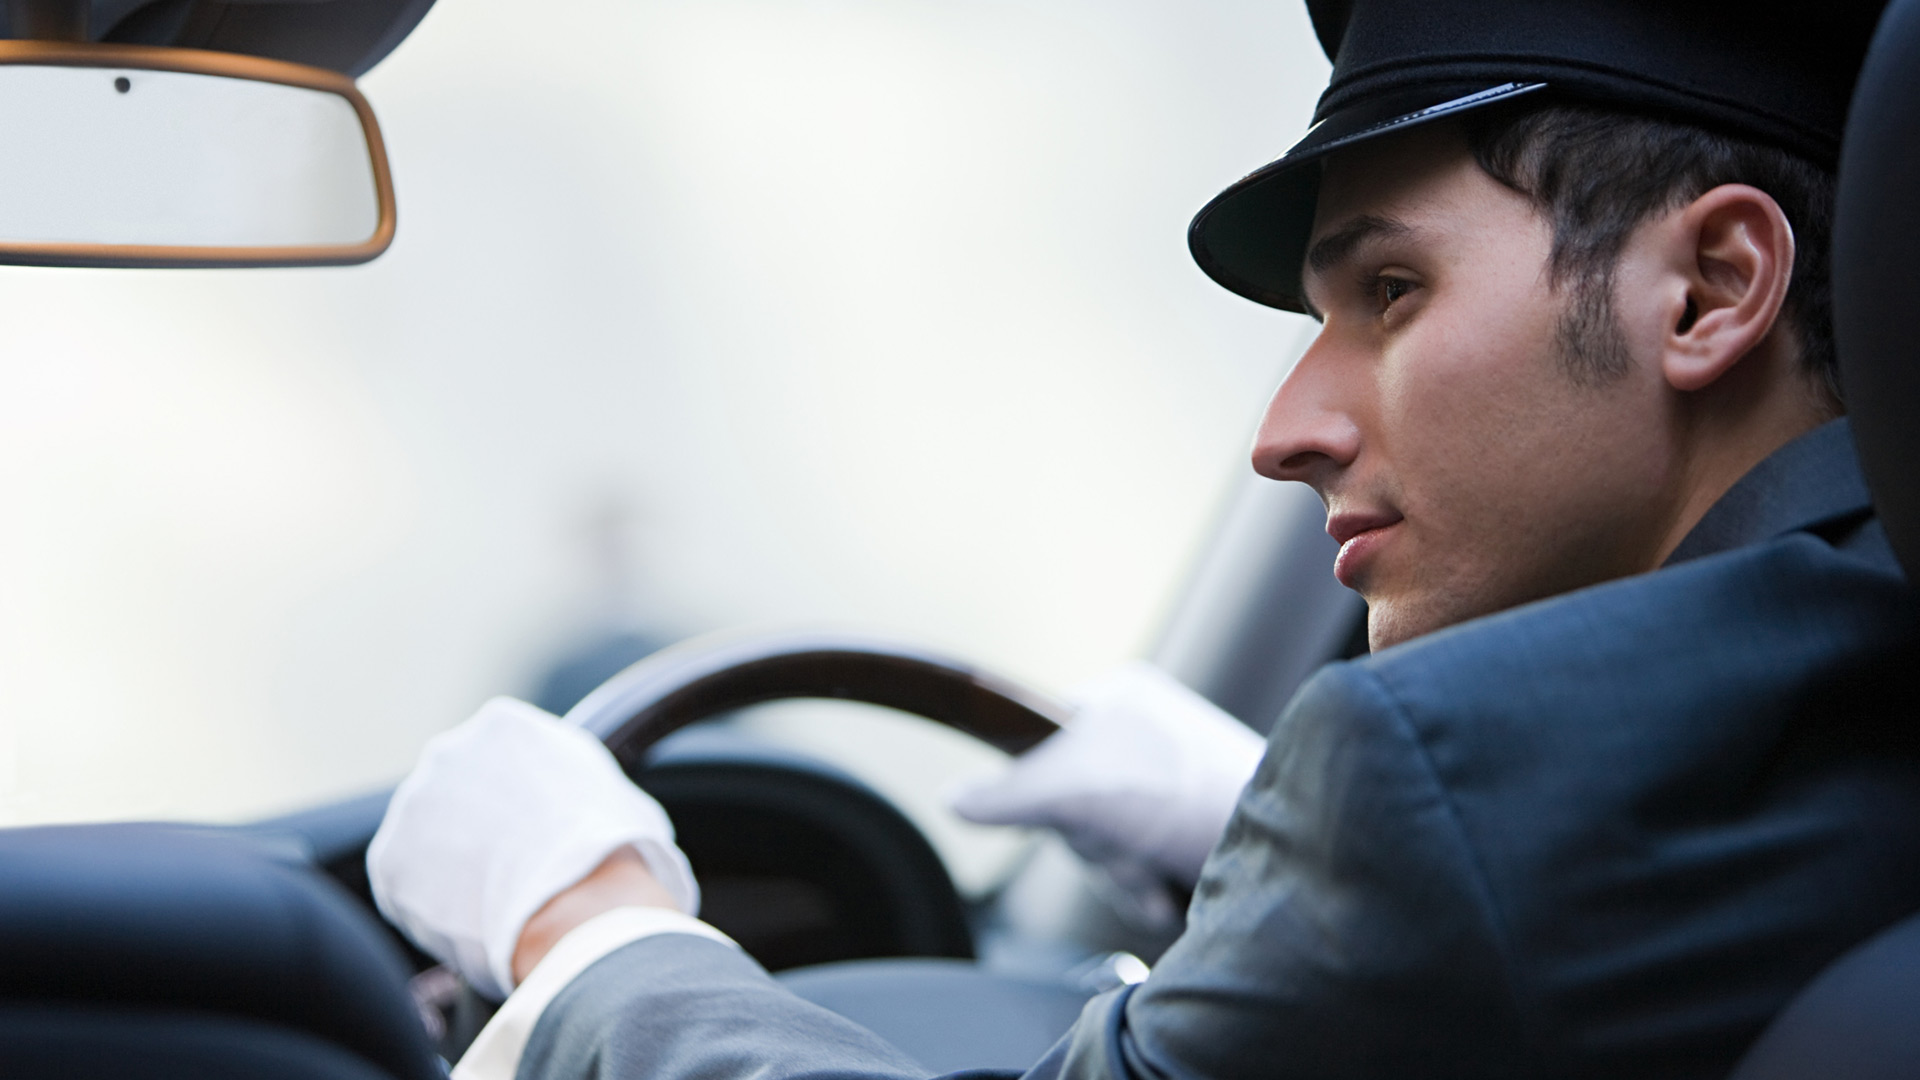 Personal chauffeur | Sheknows.com